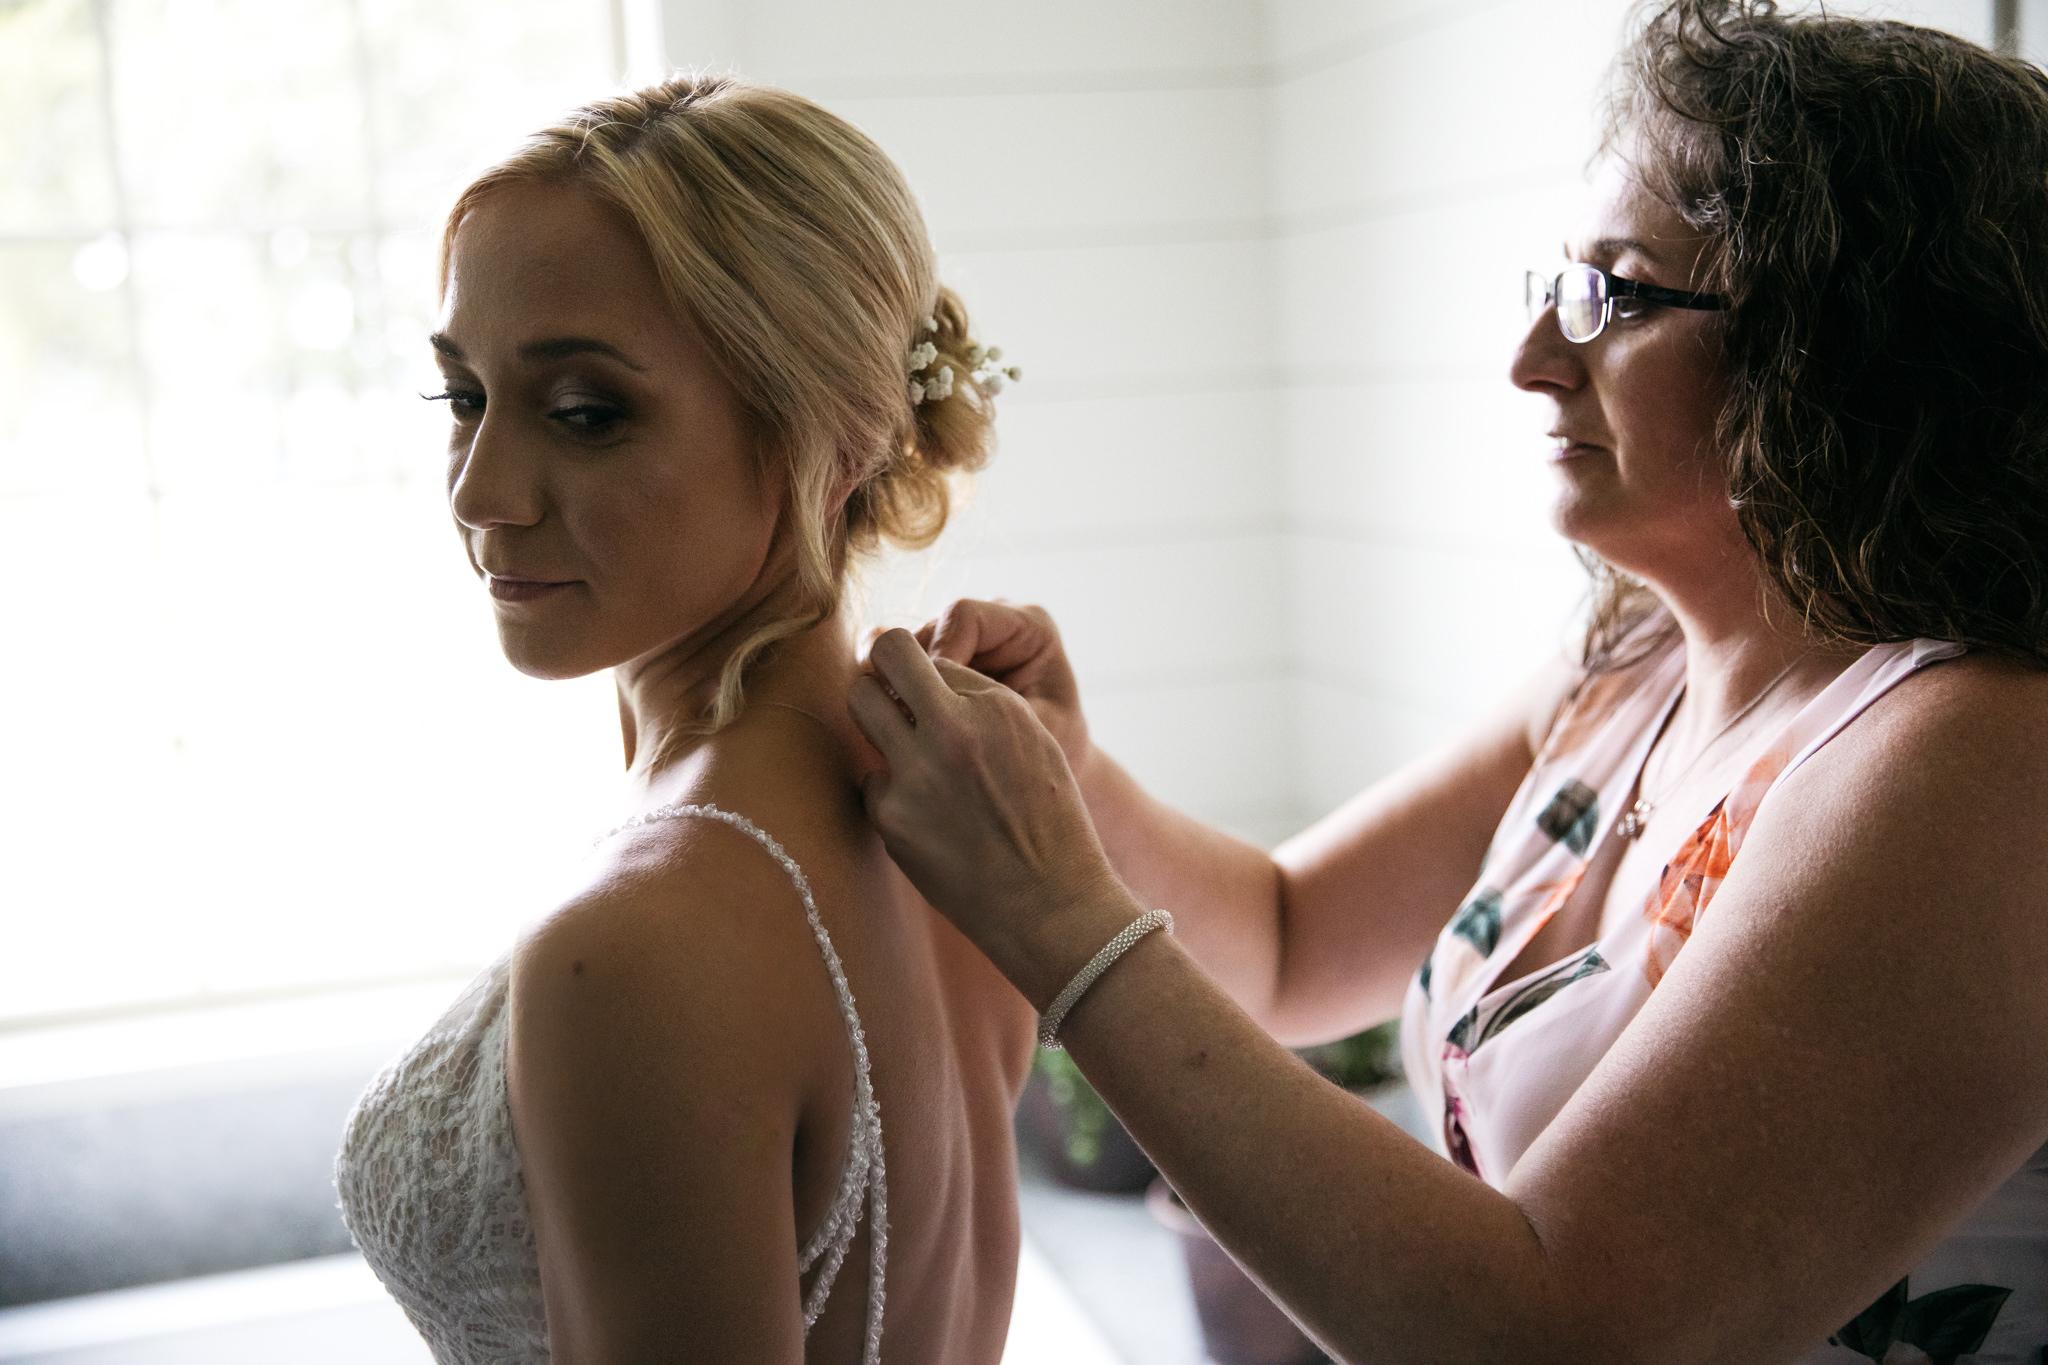 backyard-wedding-thewarmtharoundyou-lexy-branson-18.jpg